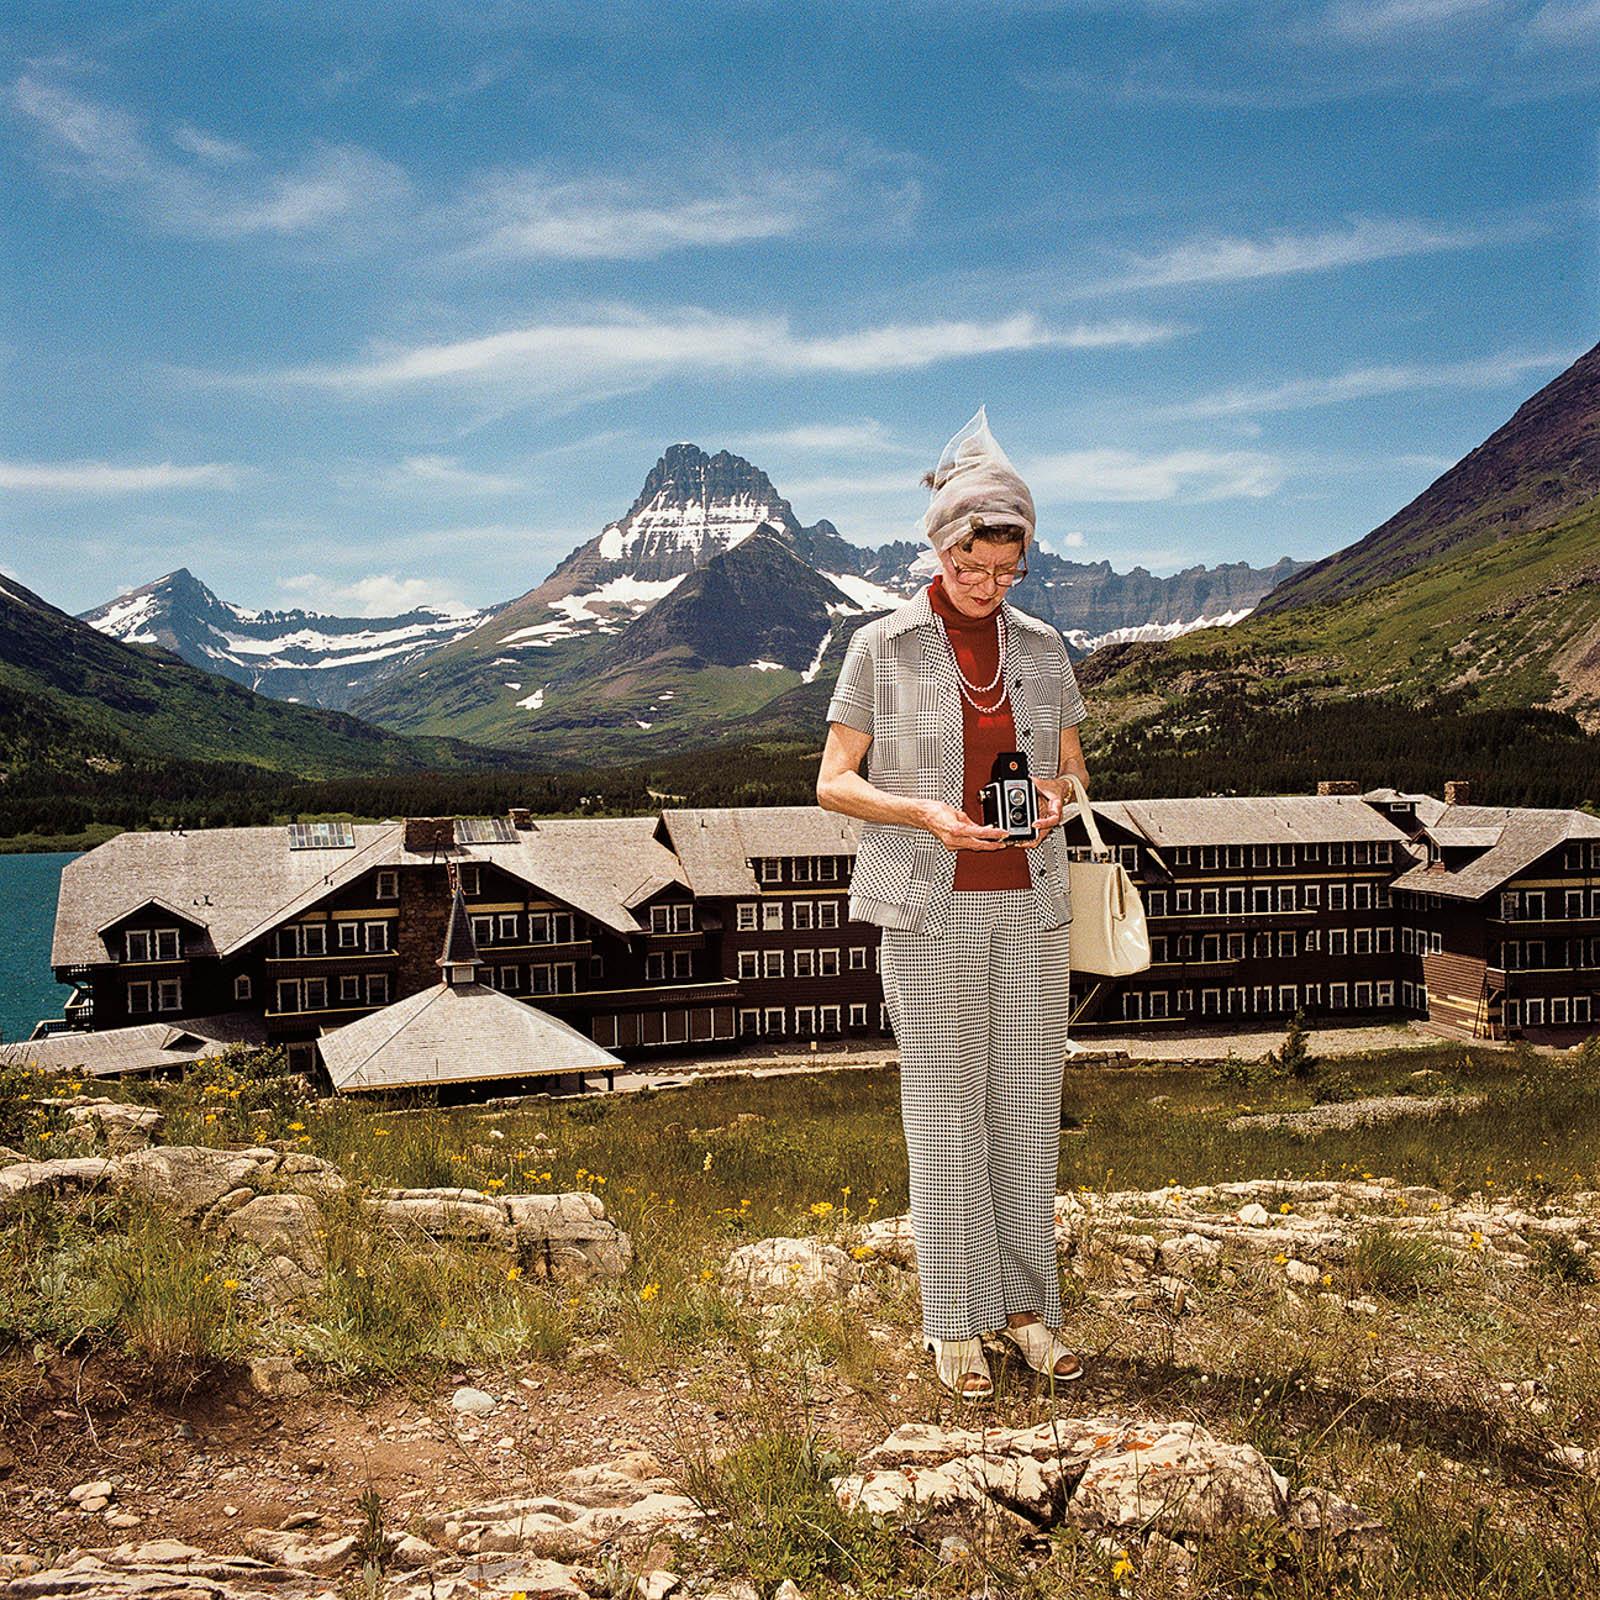 Woman at Many Glacier Hotel, Glacier National Park, Montana 1981